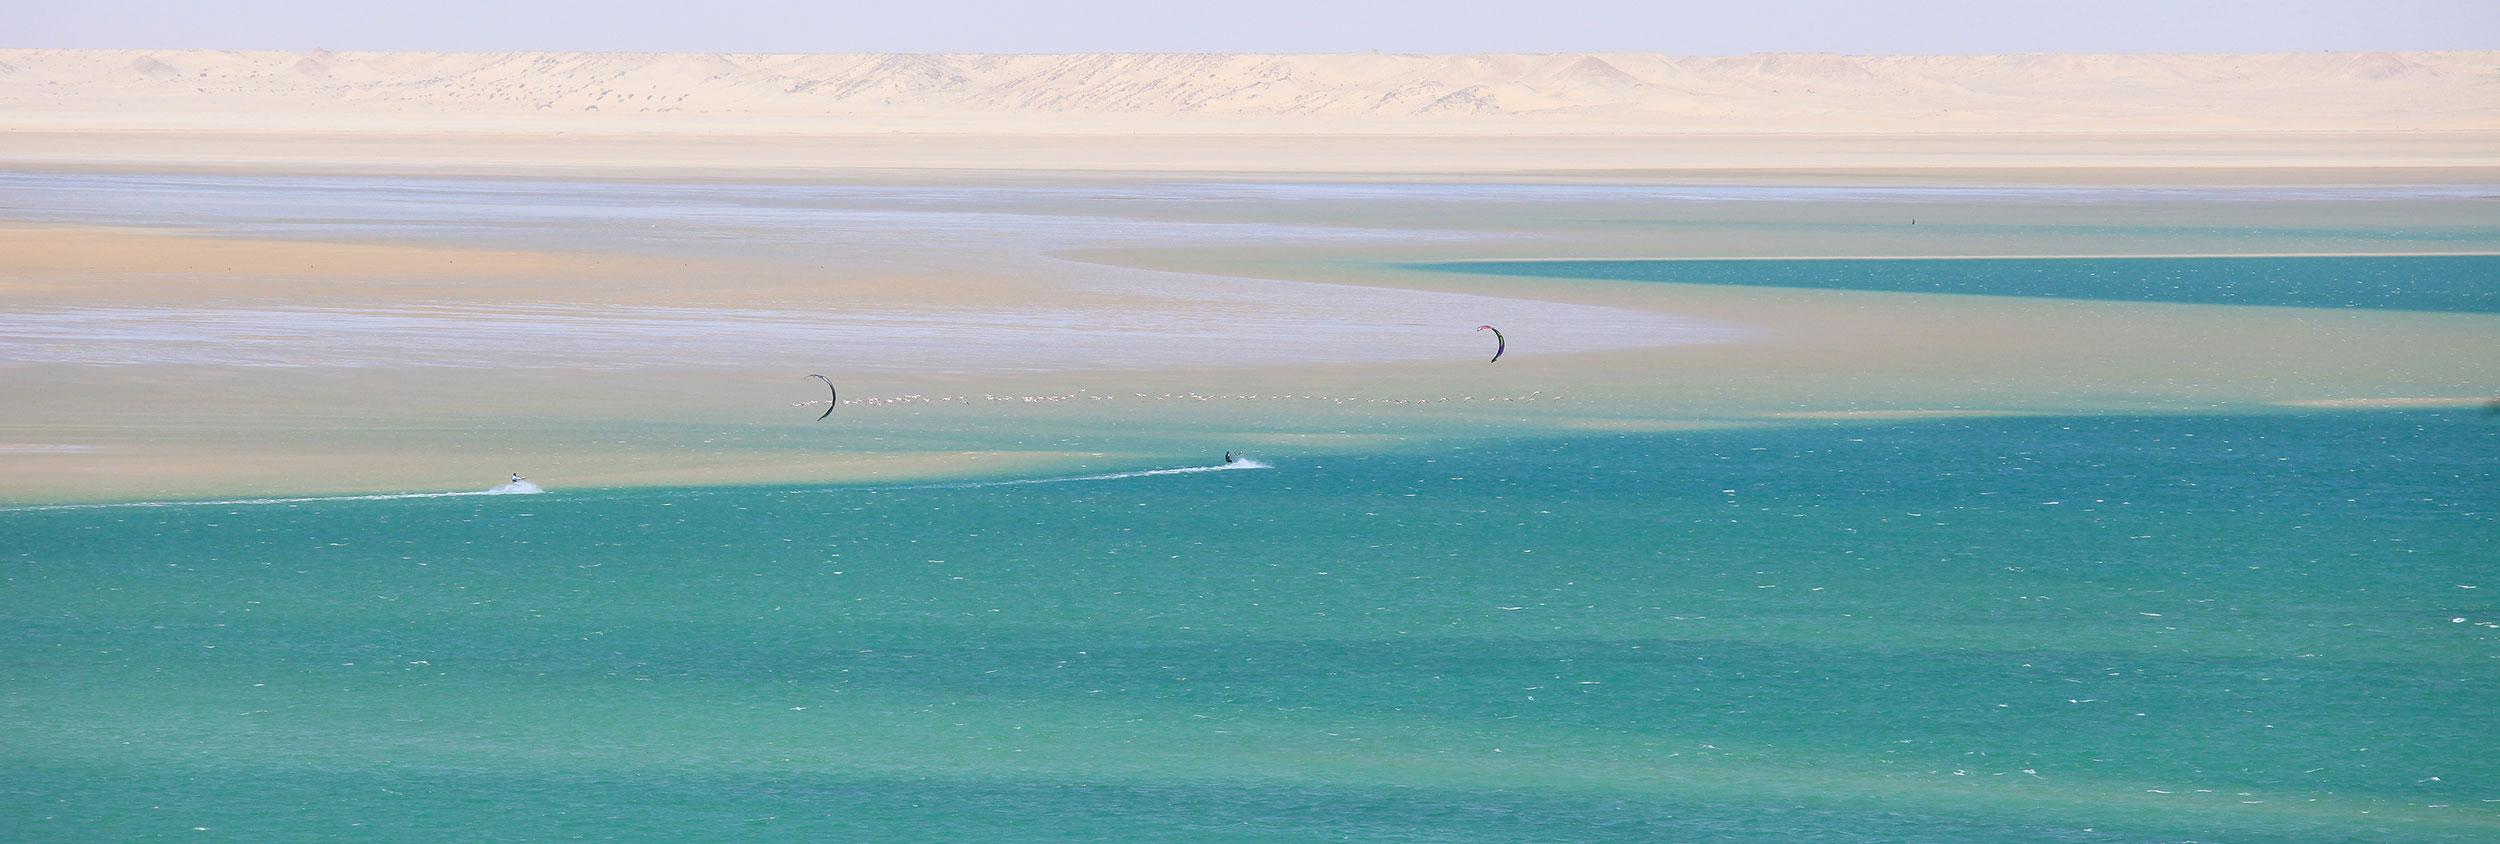 Kitesurfing Speed Spot, Dakhla Morocco by Club Mistral